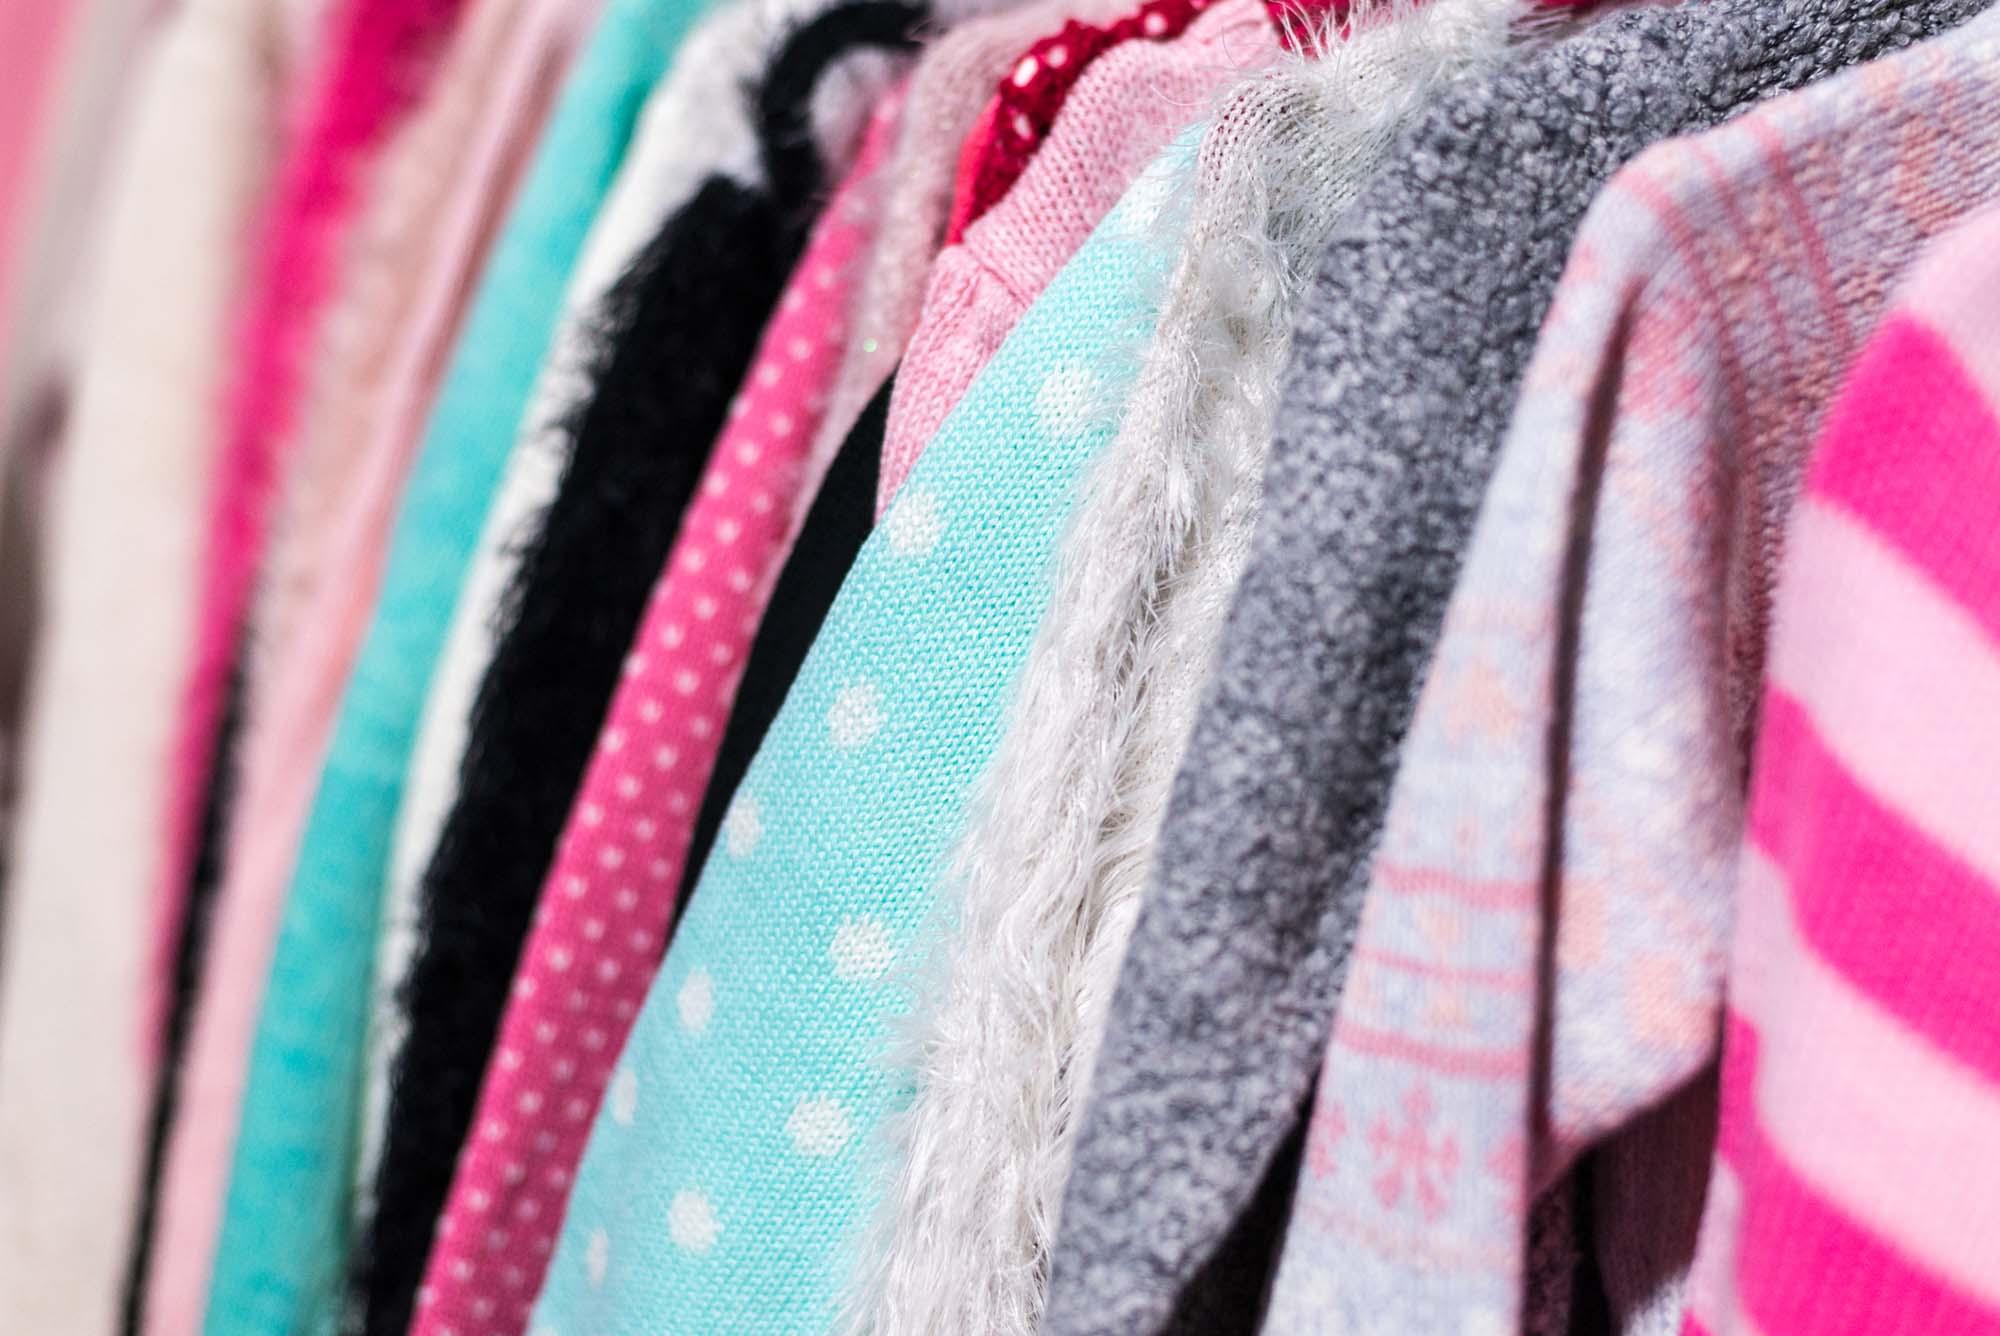 Multicoloured tops on hangers